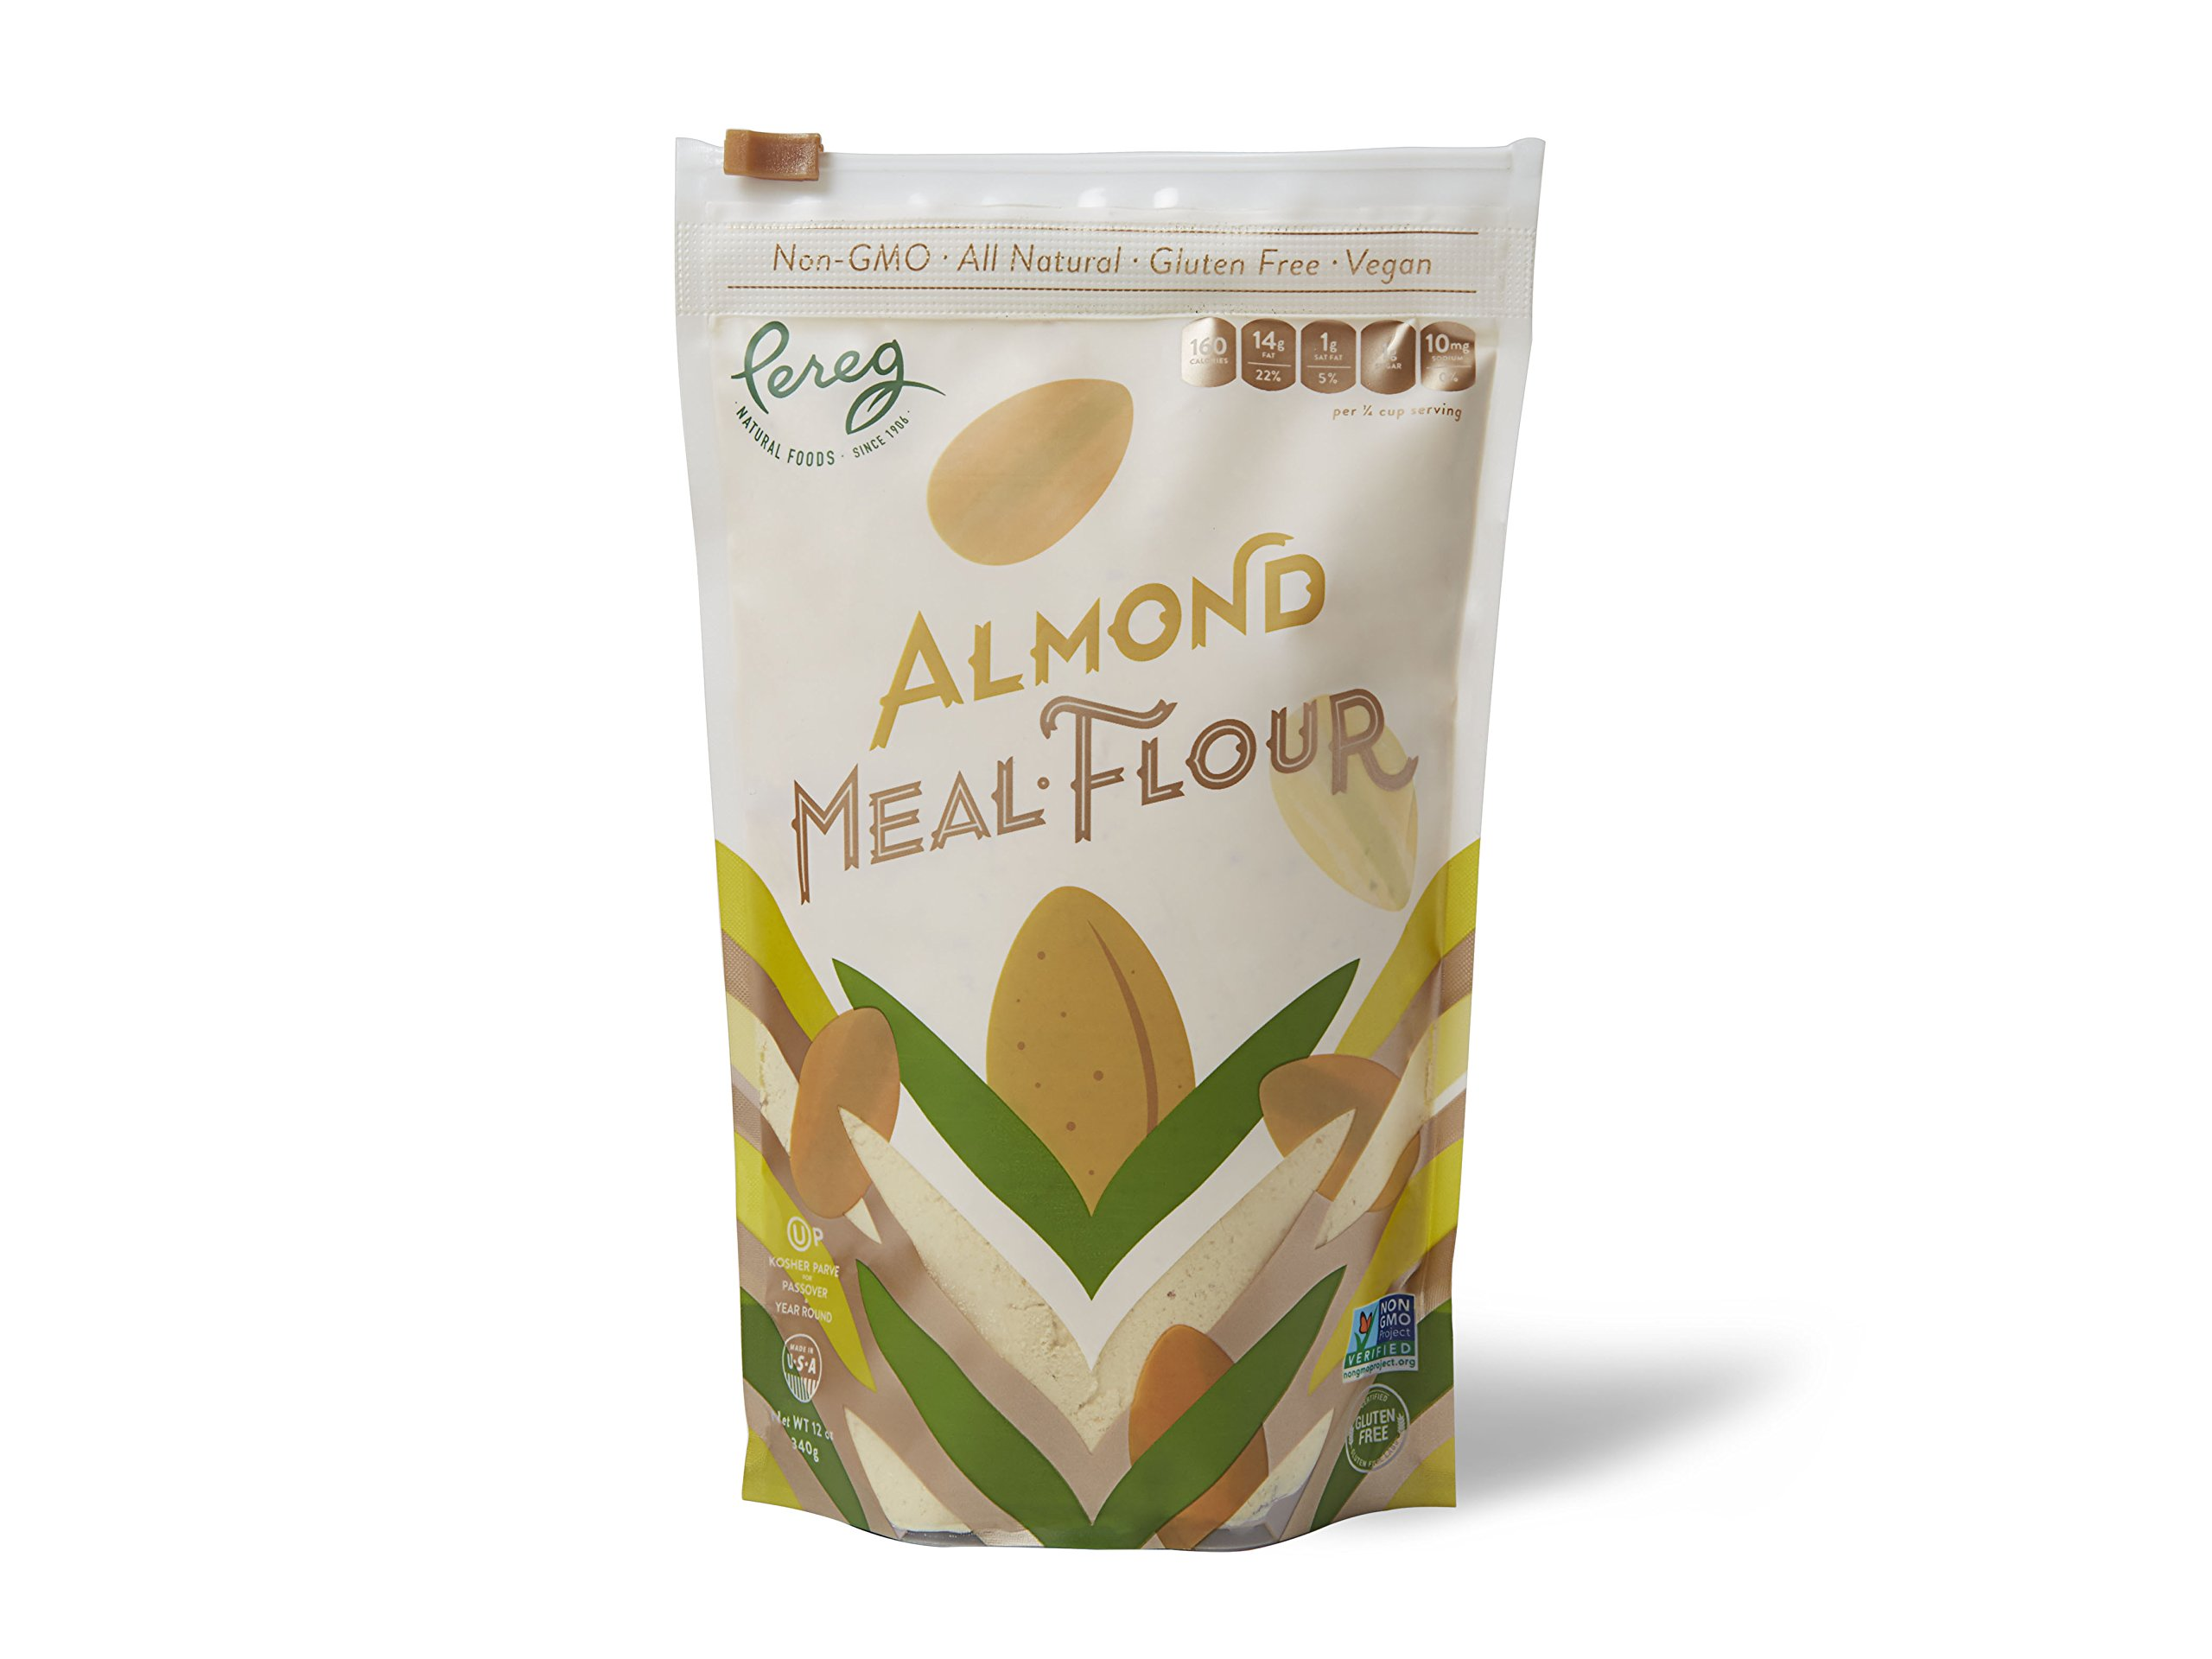 Pereg Natural Foods Multi-Purpose Alternative Gluten Free Almond Flour, All-Natural, Non-GMO, Kosher, Vegan, 12oz